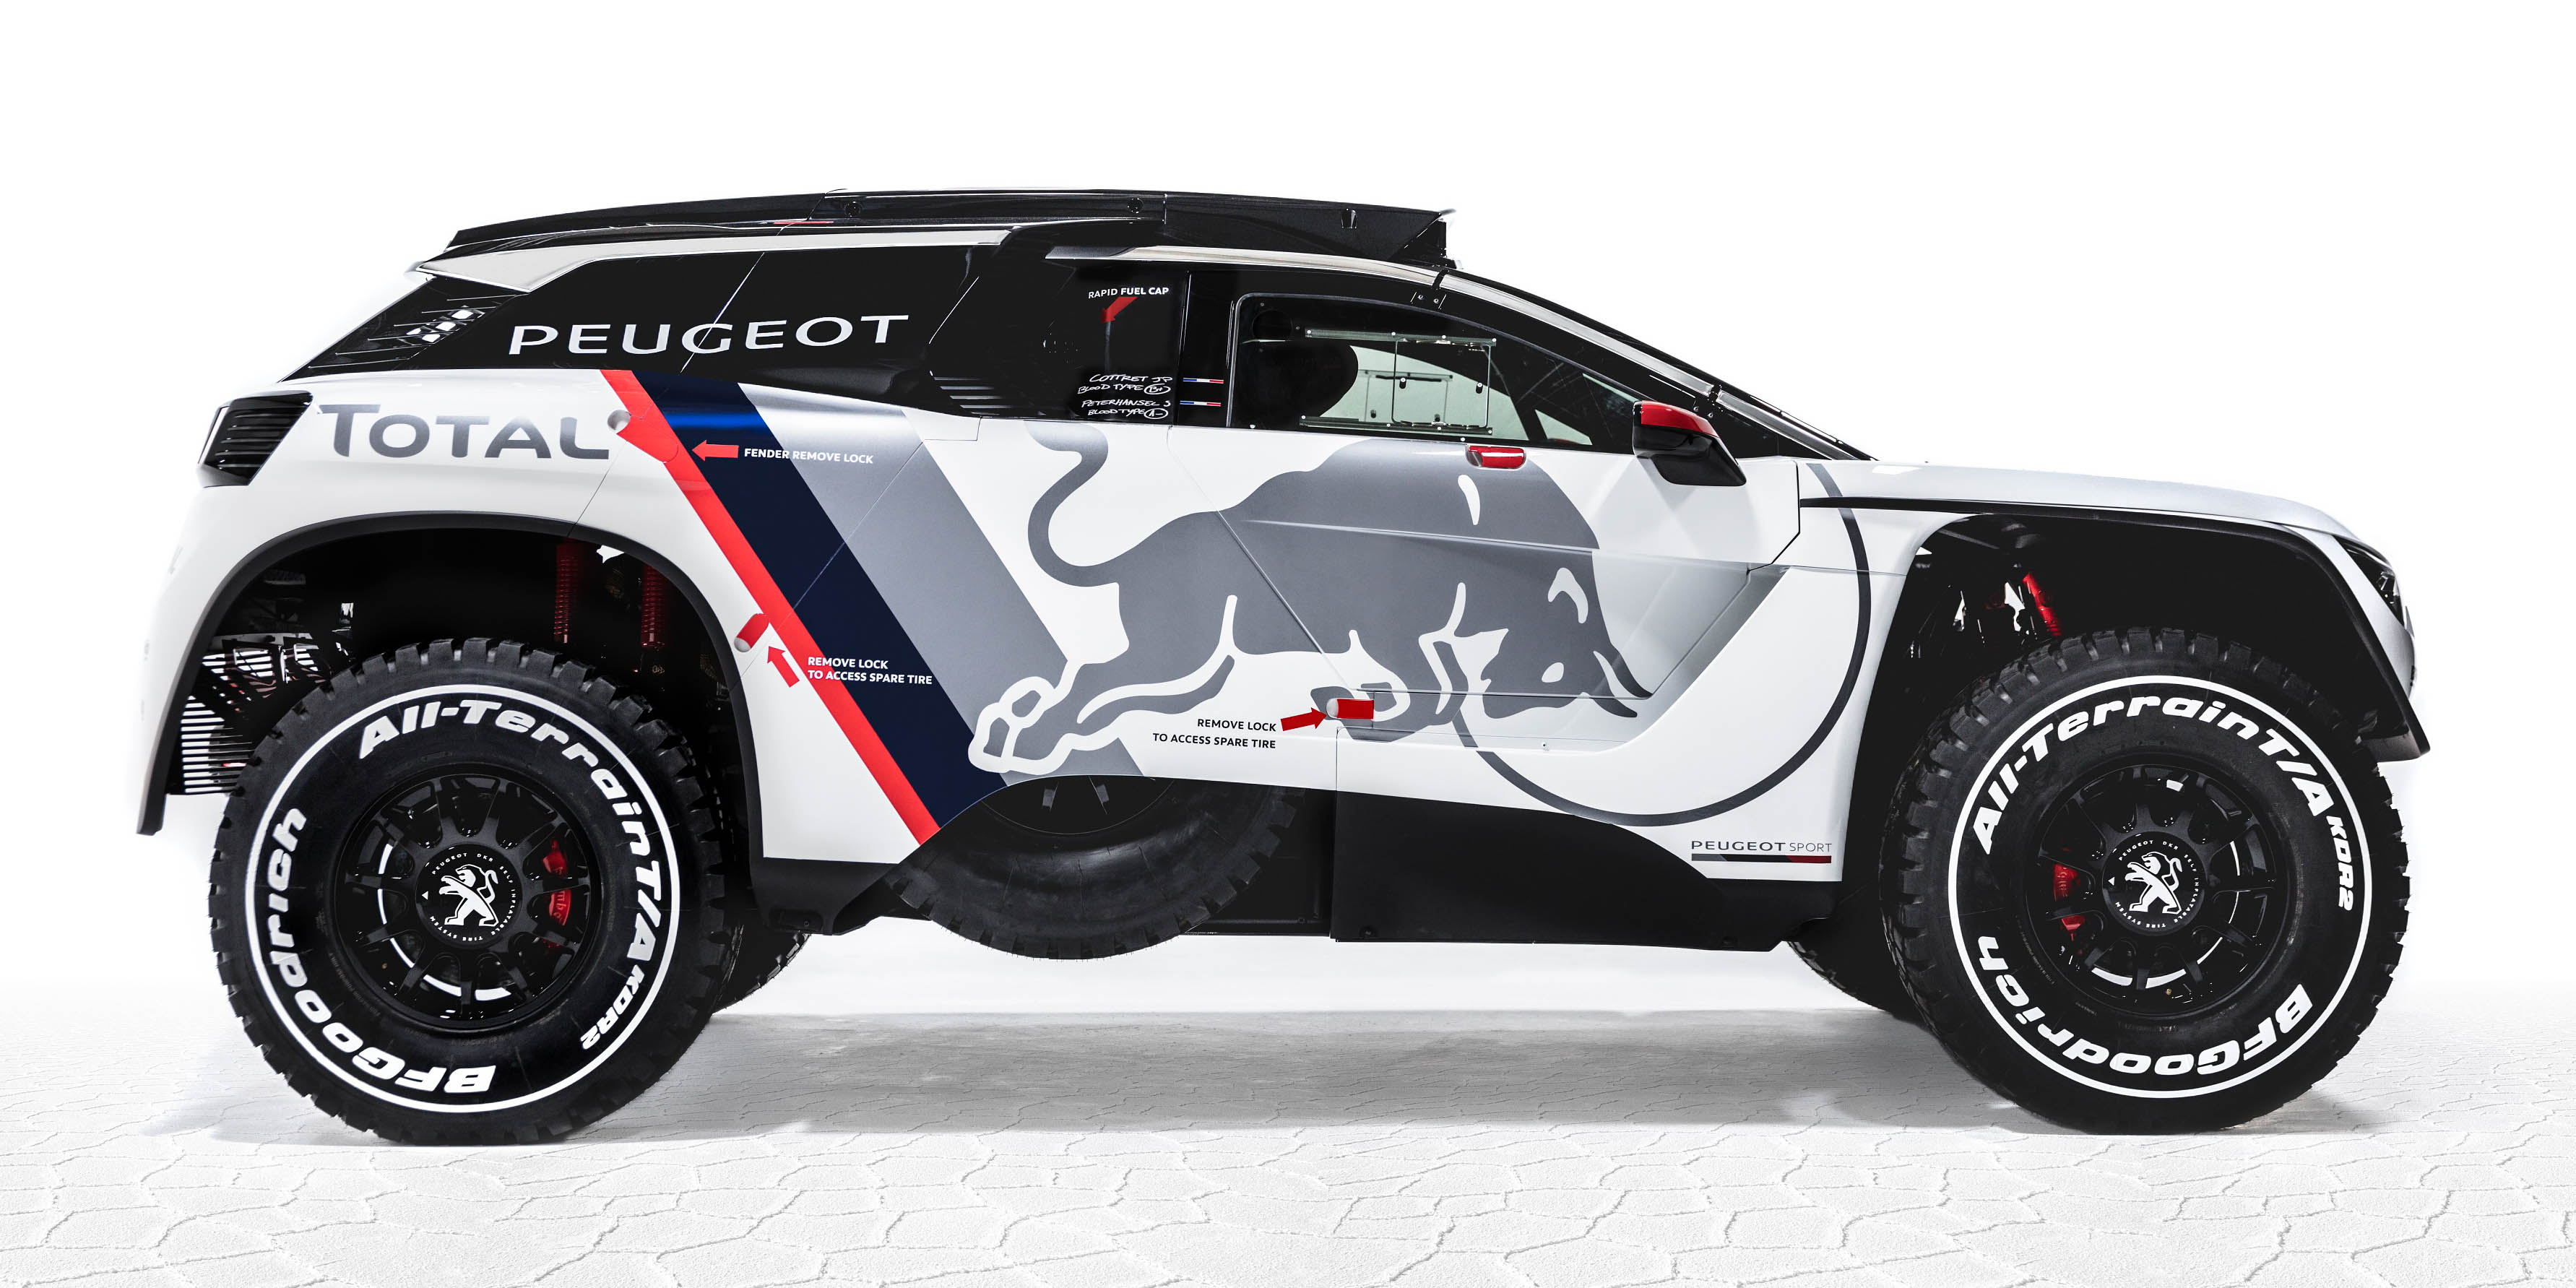 2017 Peugeot 3008 Dkr Twin Turbo Rear Drive Suv Revealed